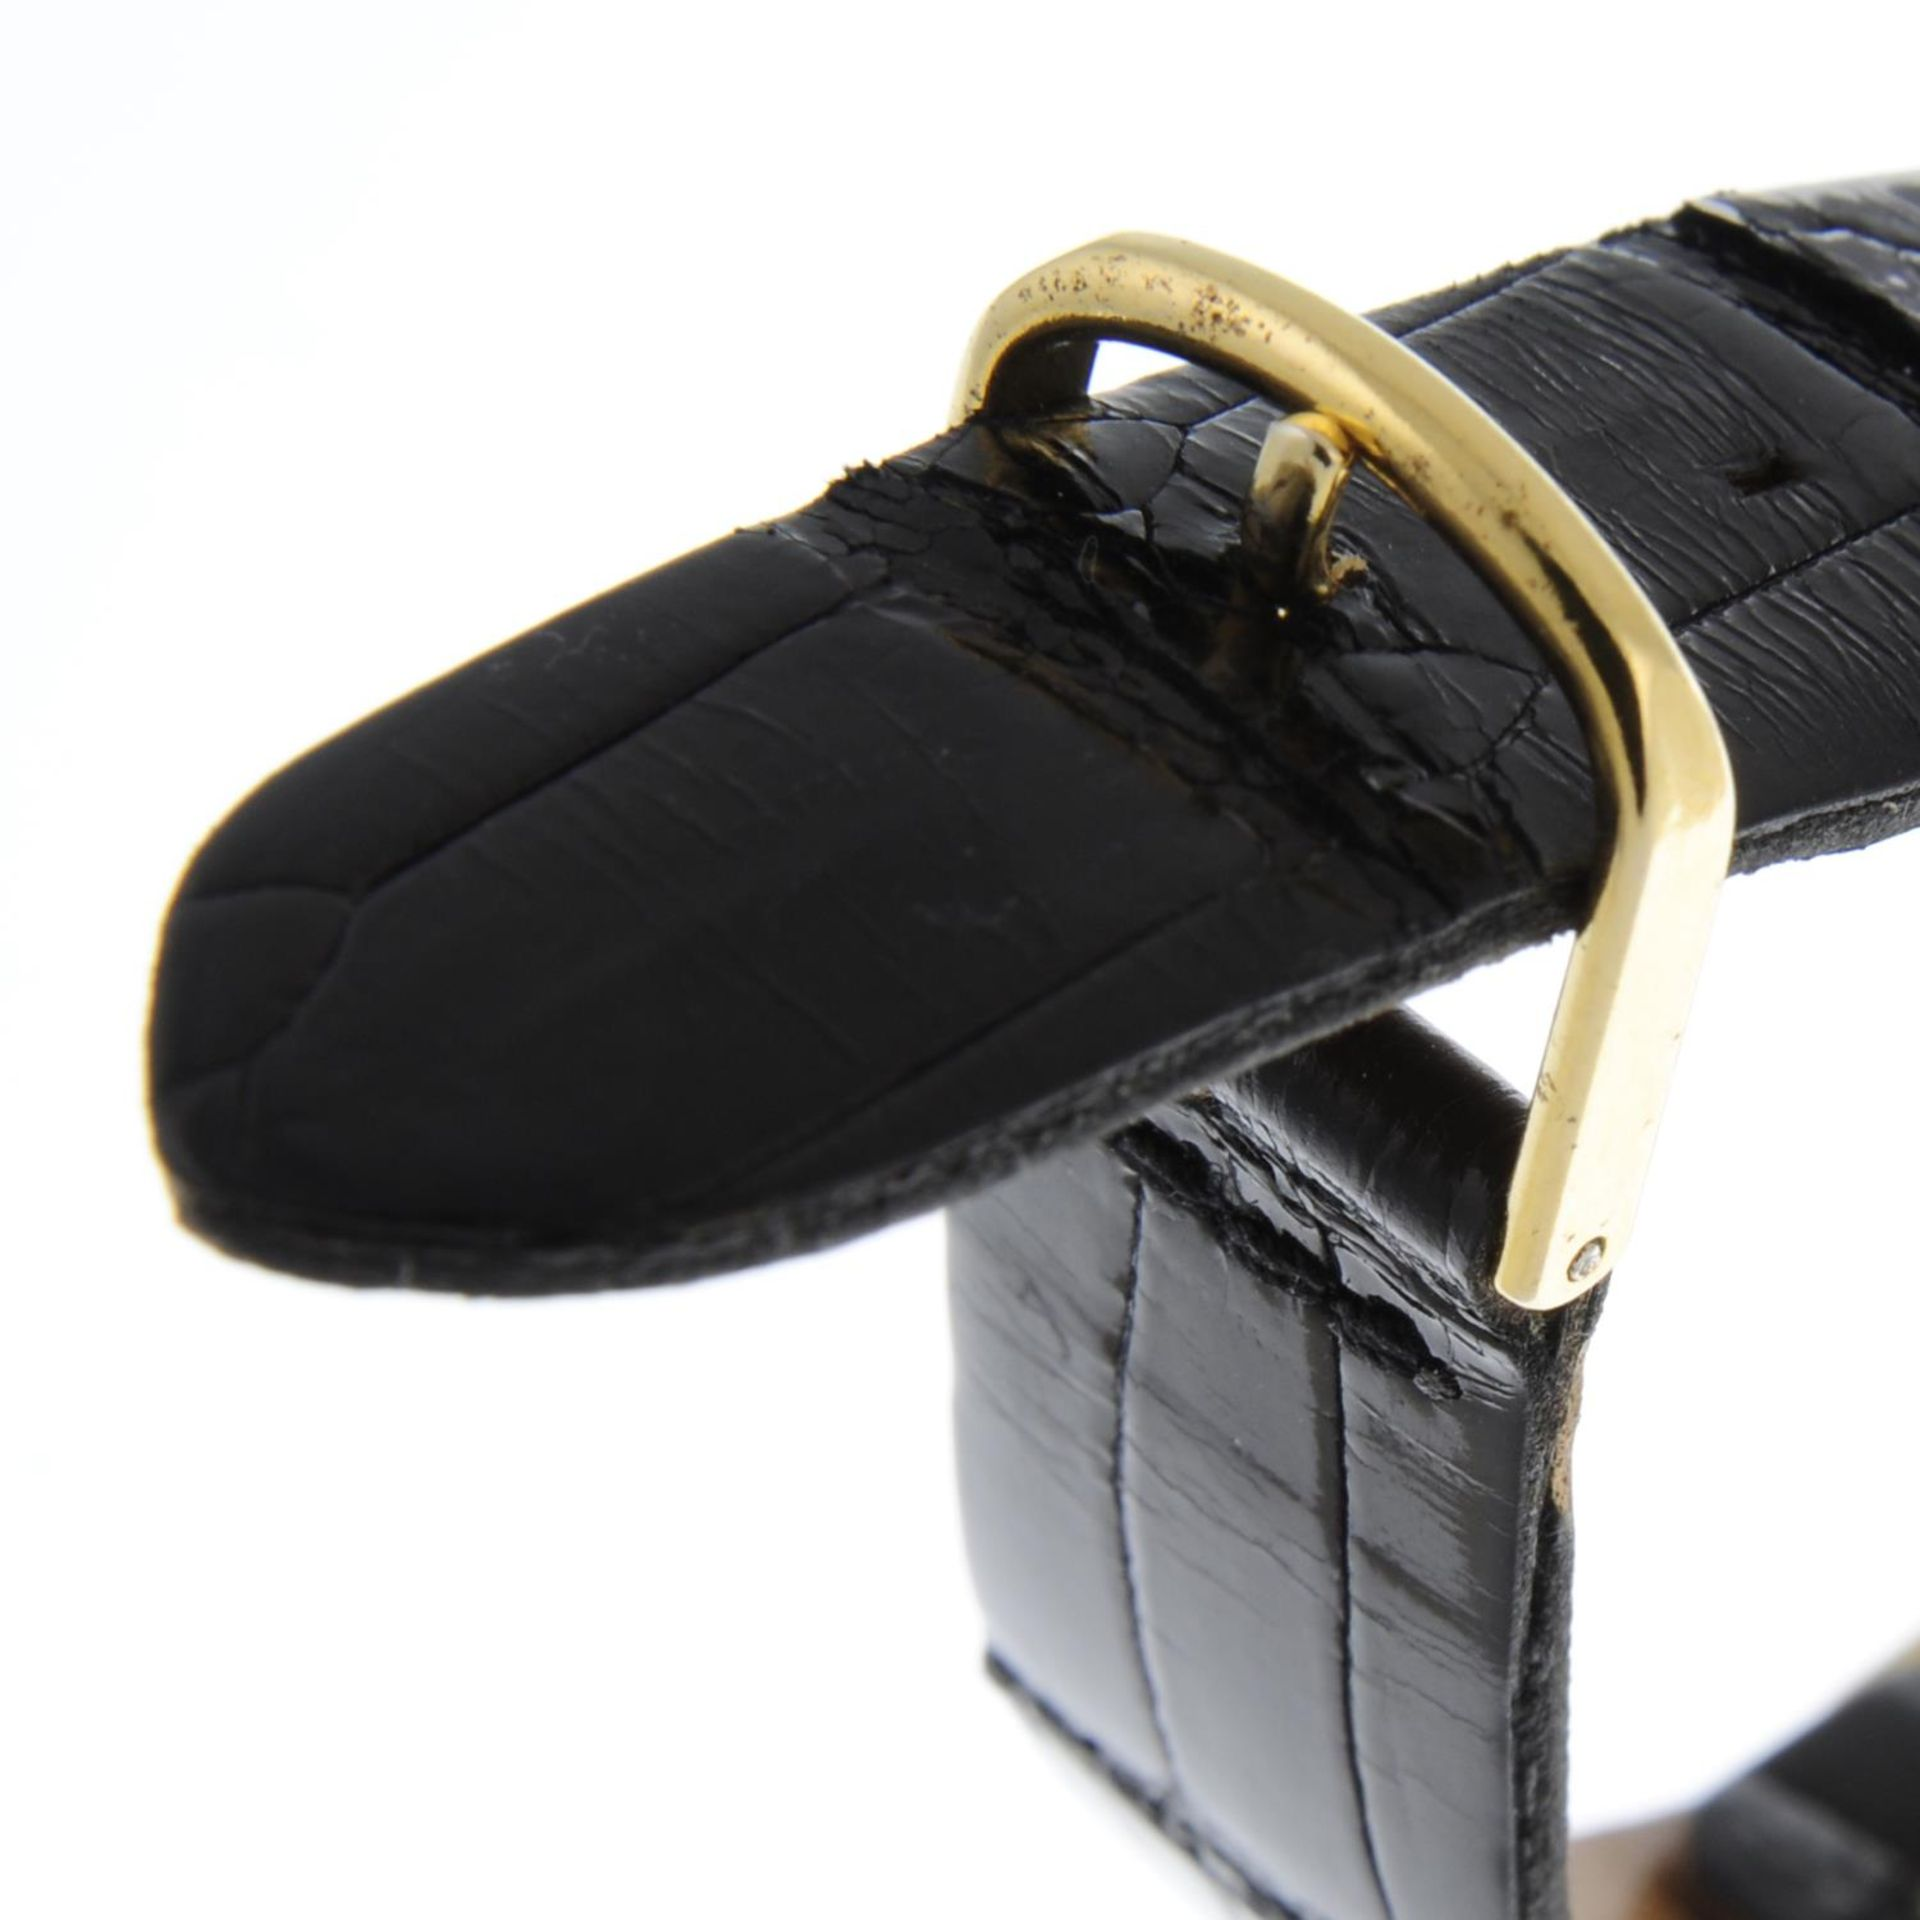 CHOPARD - a wrist watch. - Bild 2 aus 5